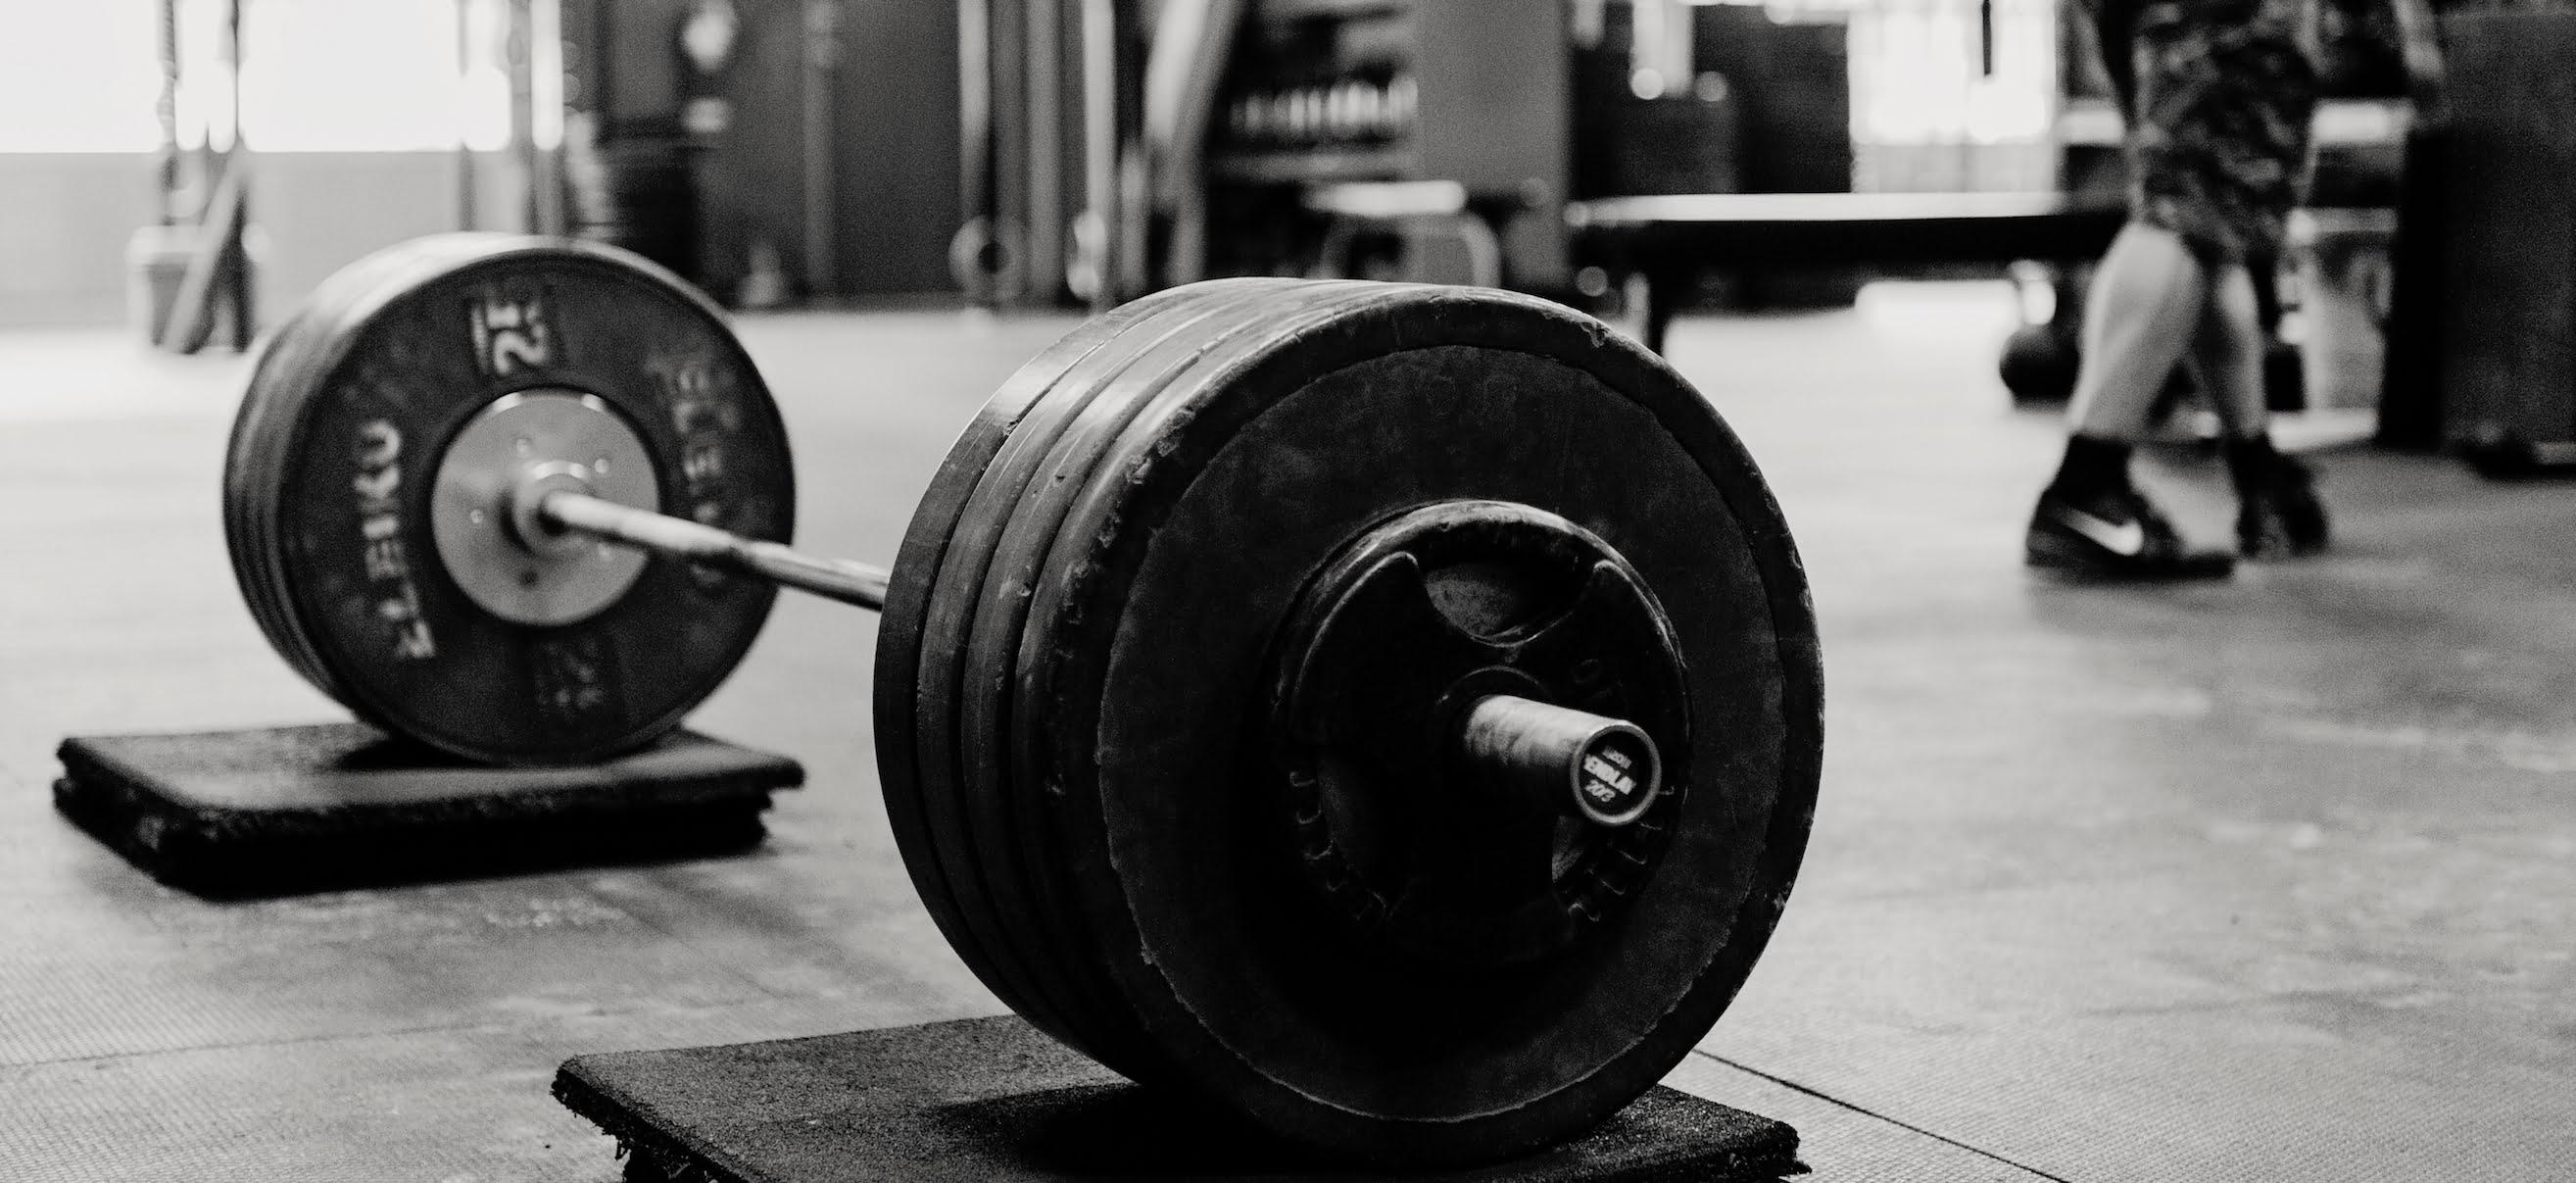 The strength-skill circuit method